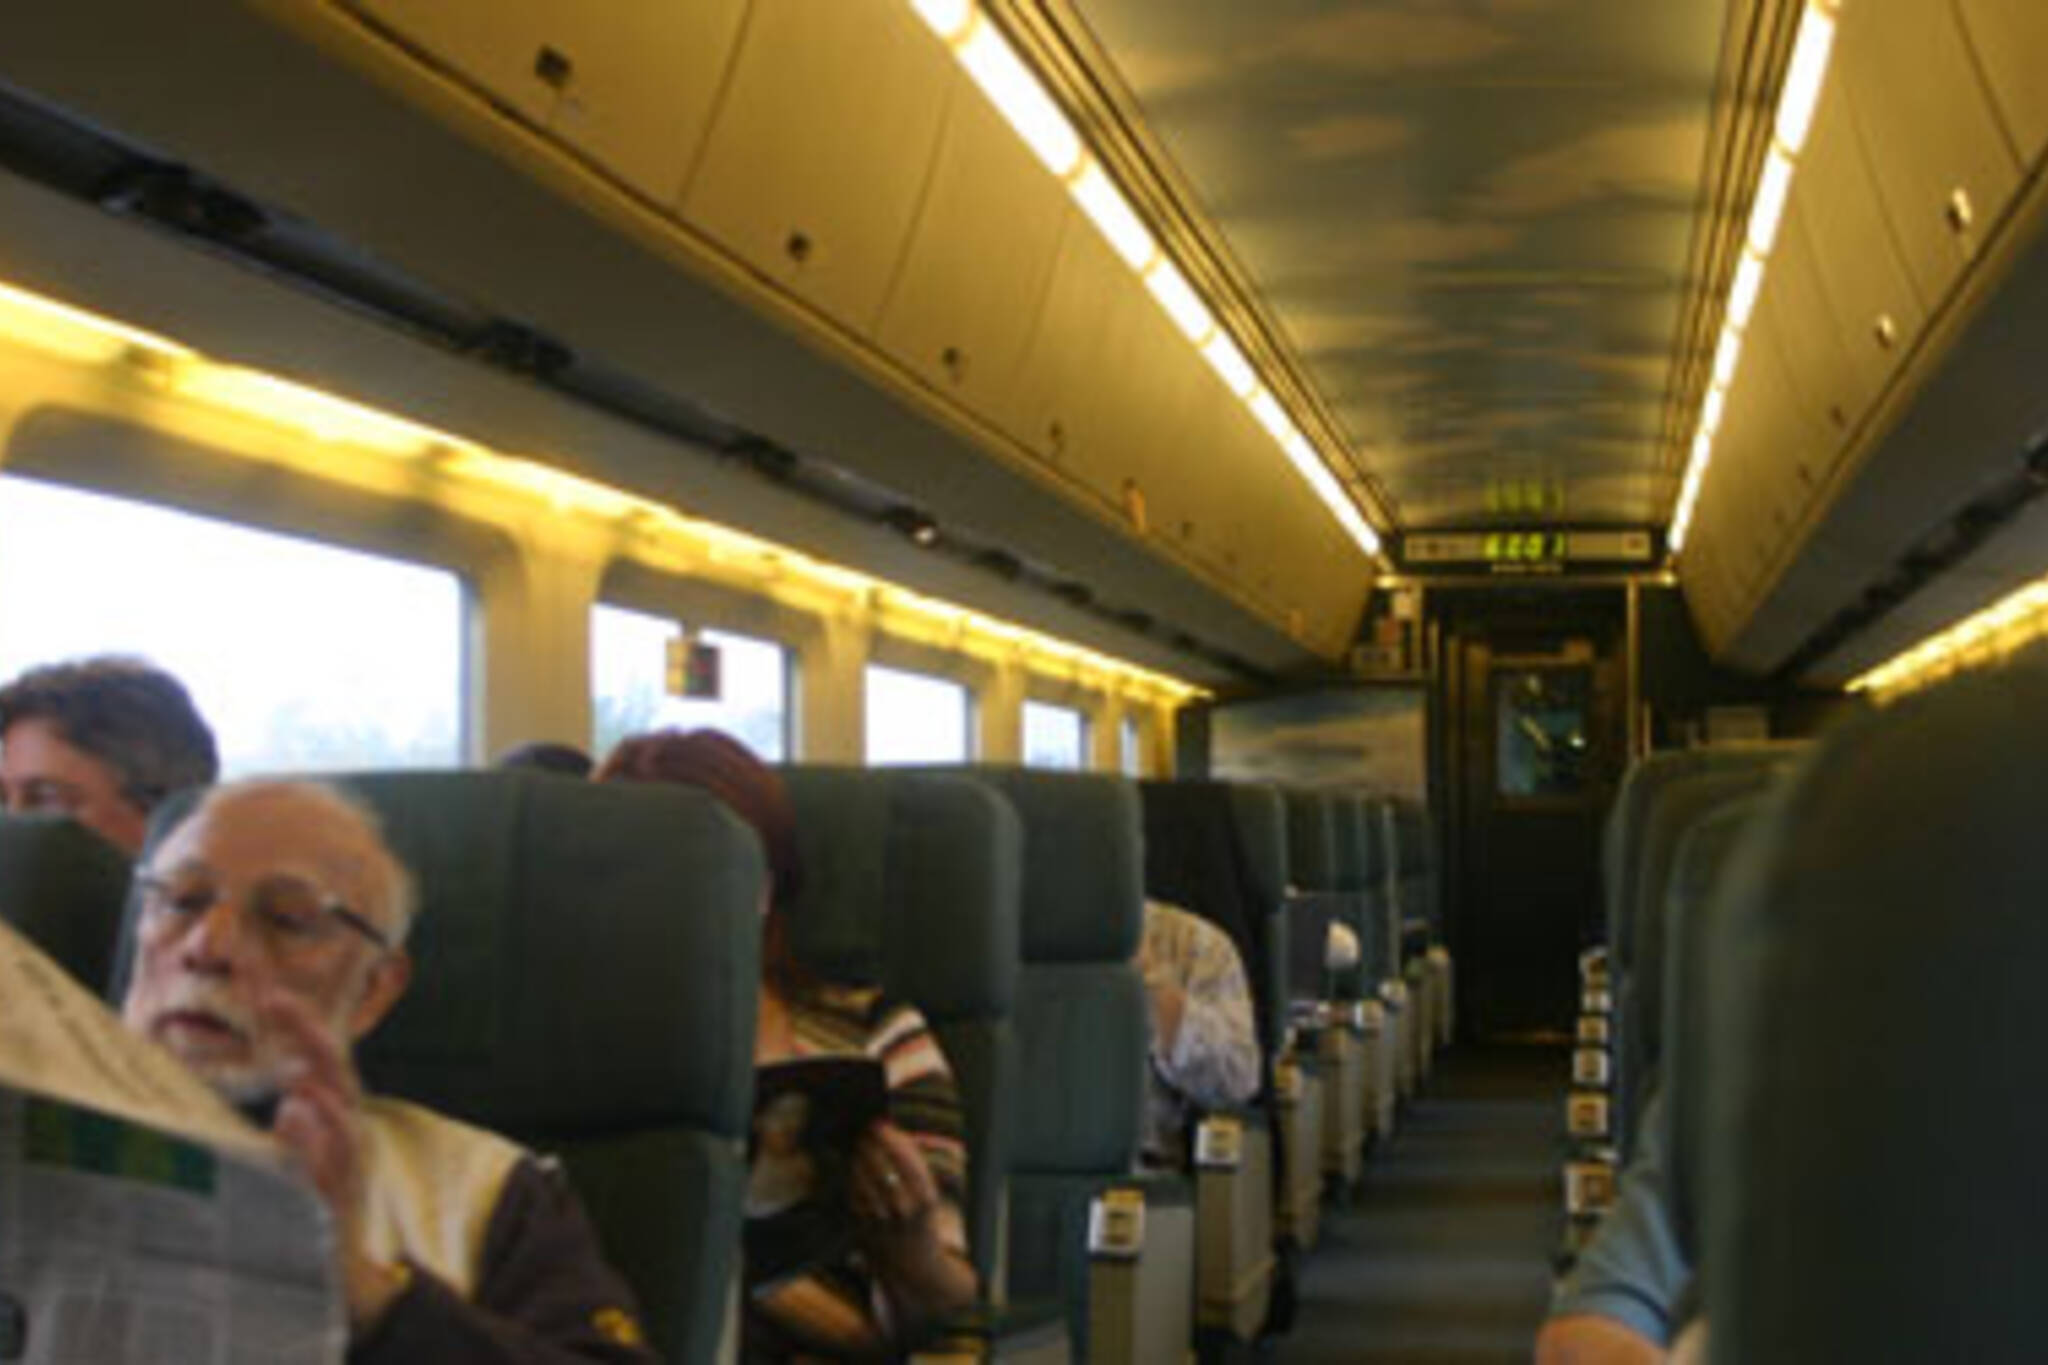 The train was comfy, but still a train